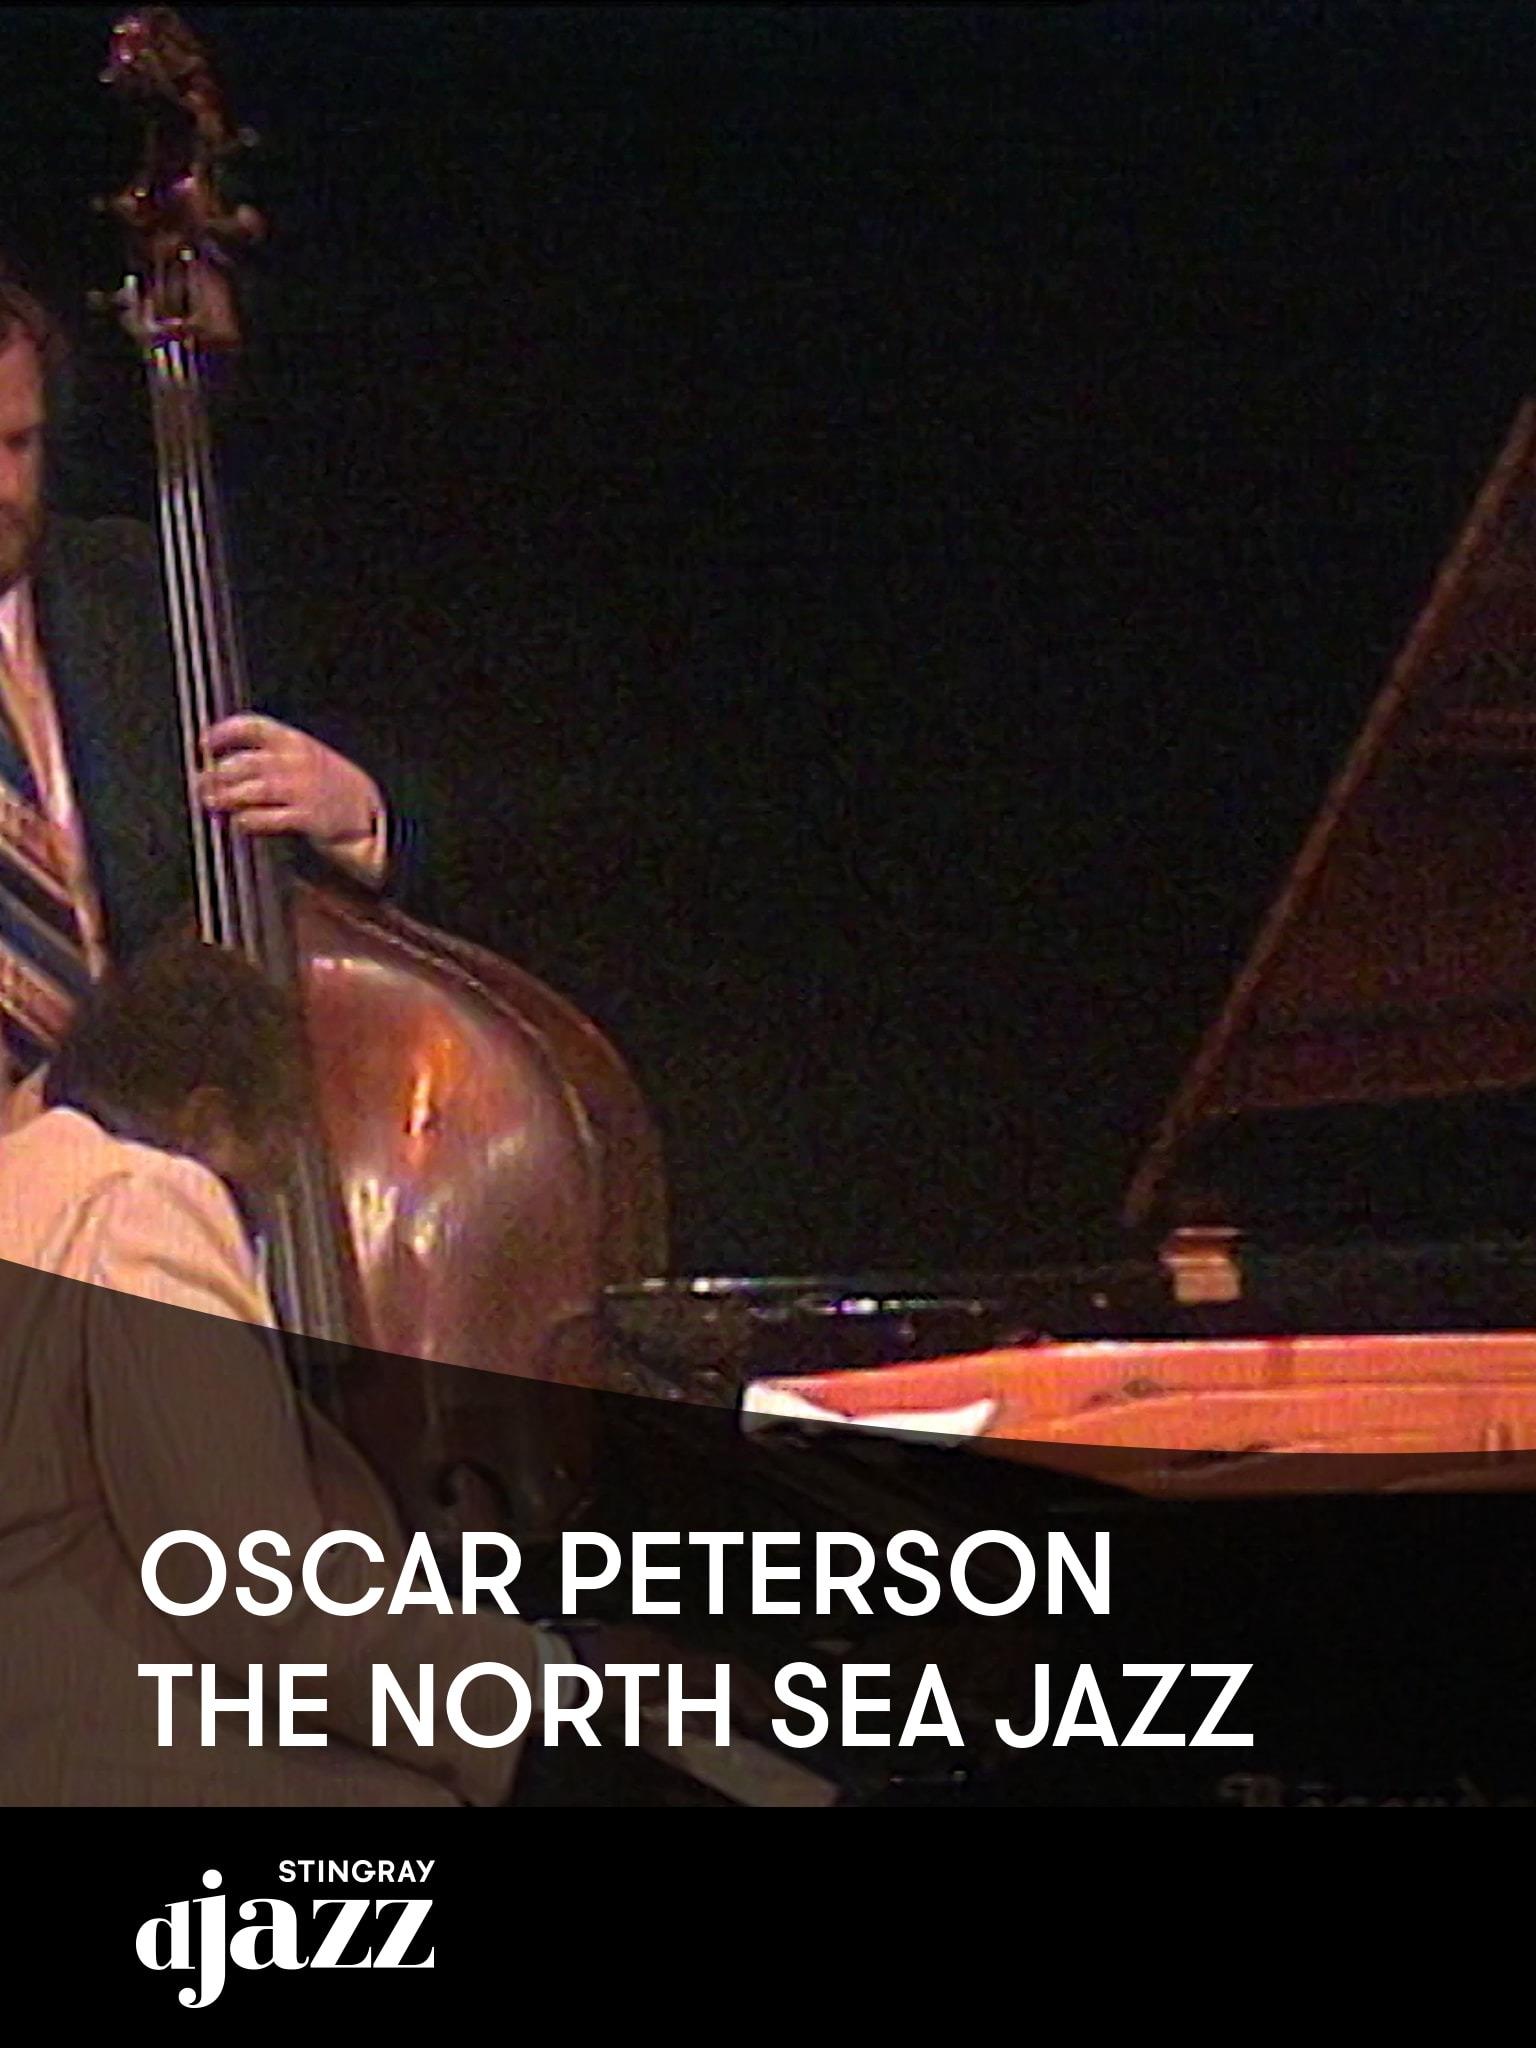 Oscar Peterson - The North Sea Jazz